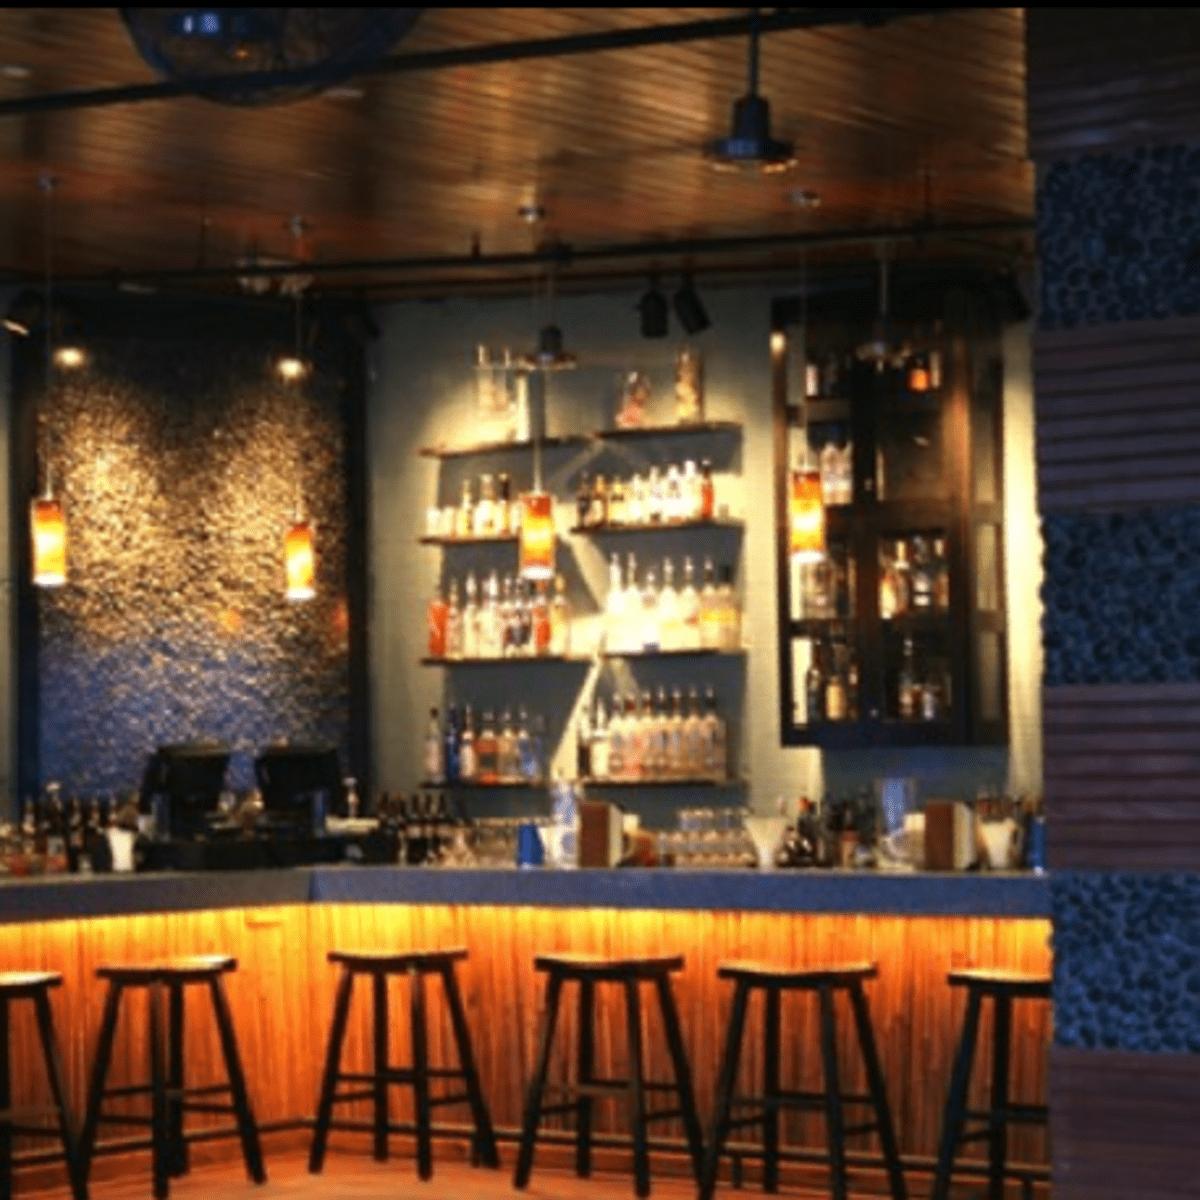 Austin Photo: Places_drinks_lanai_bar